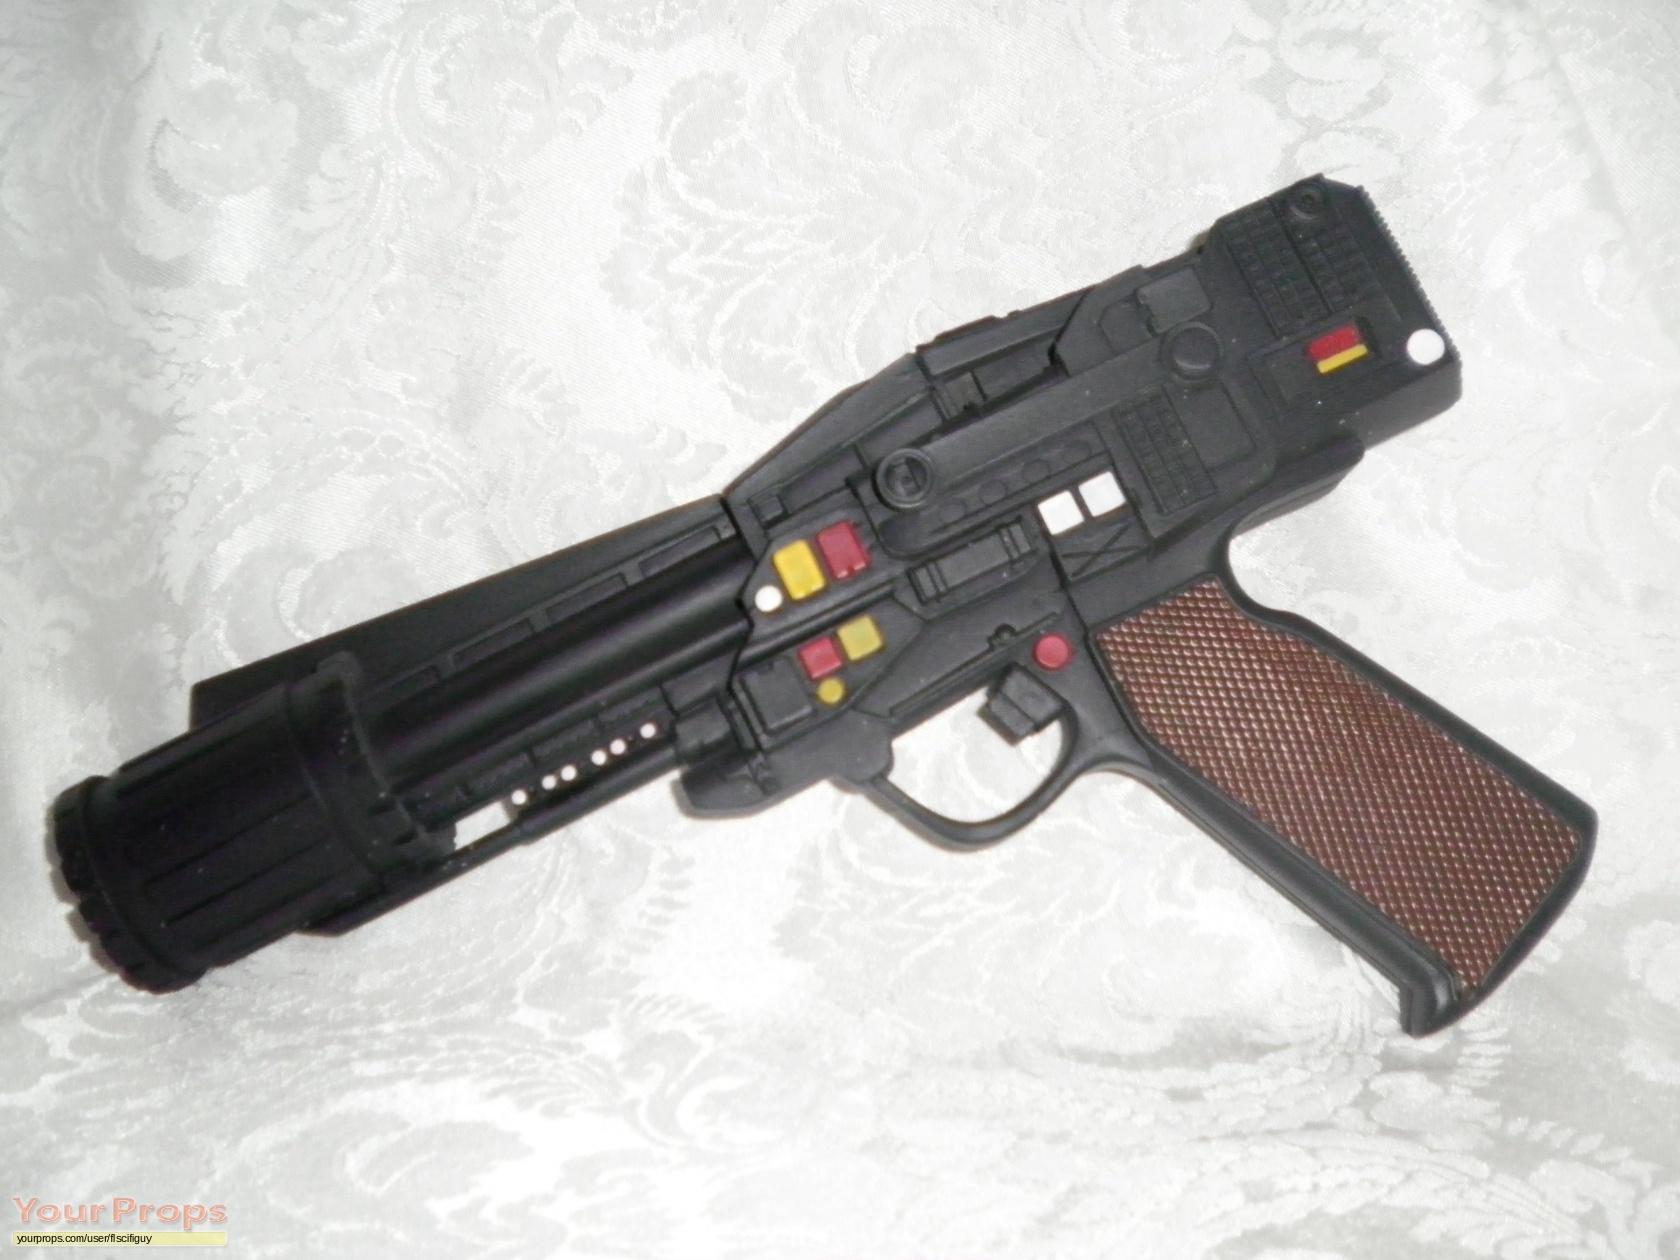 battlestar galactica replica blaster kit